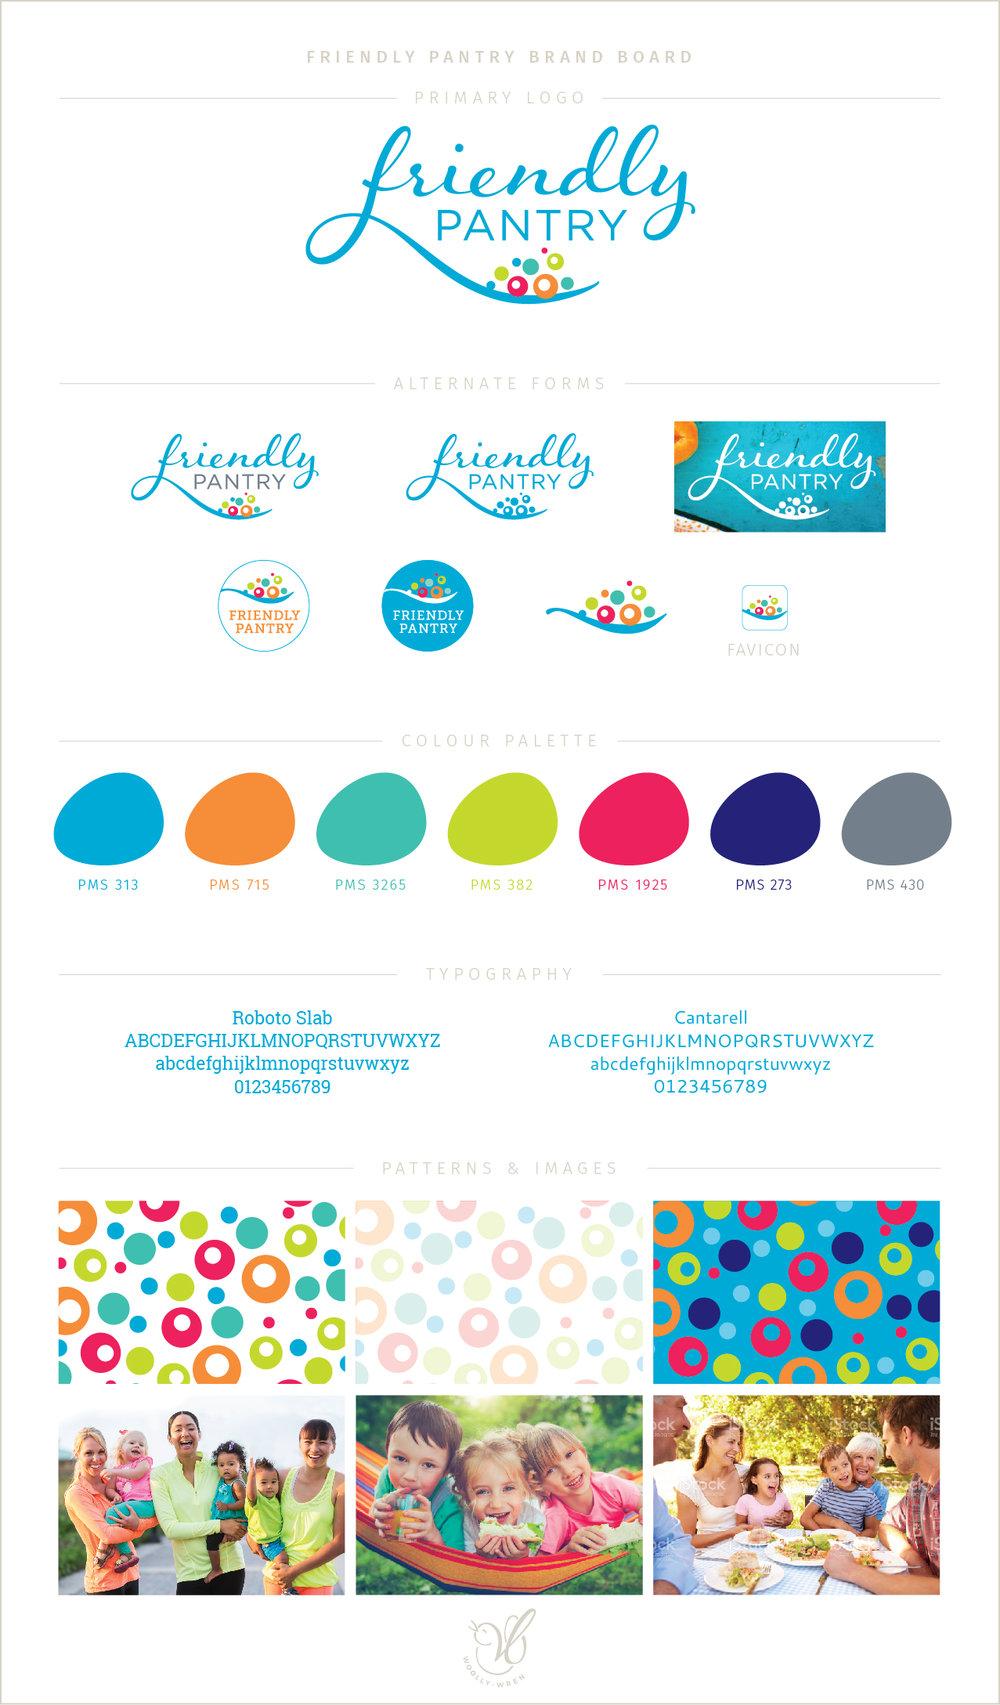 friendly pantry brand board